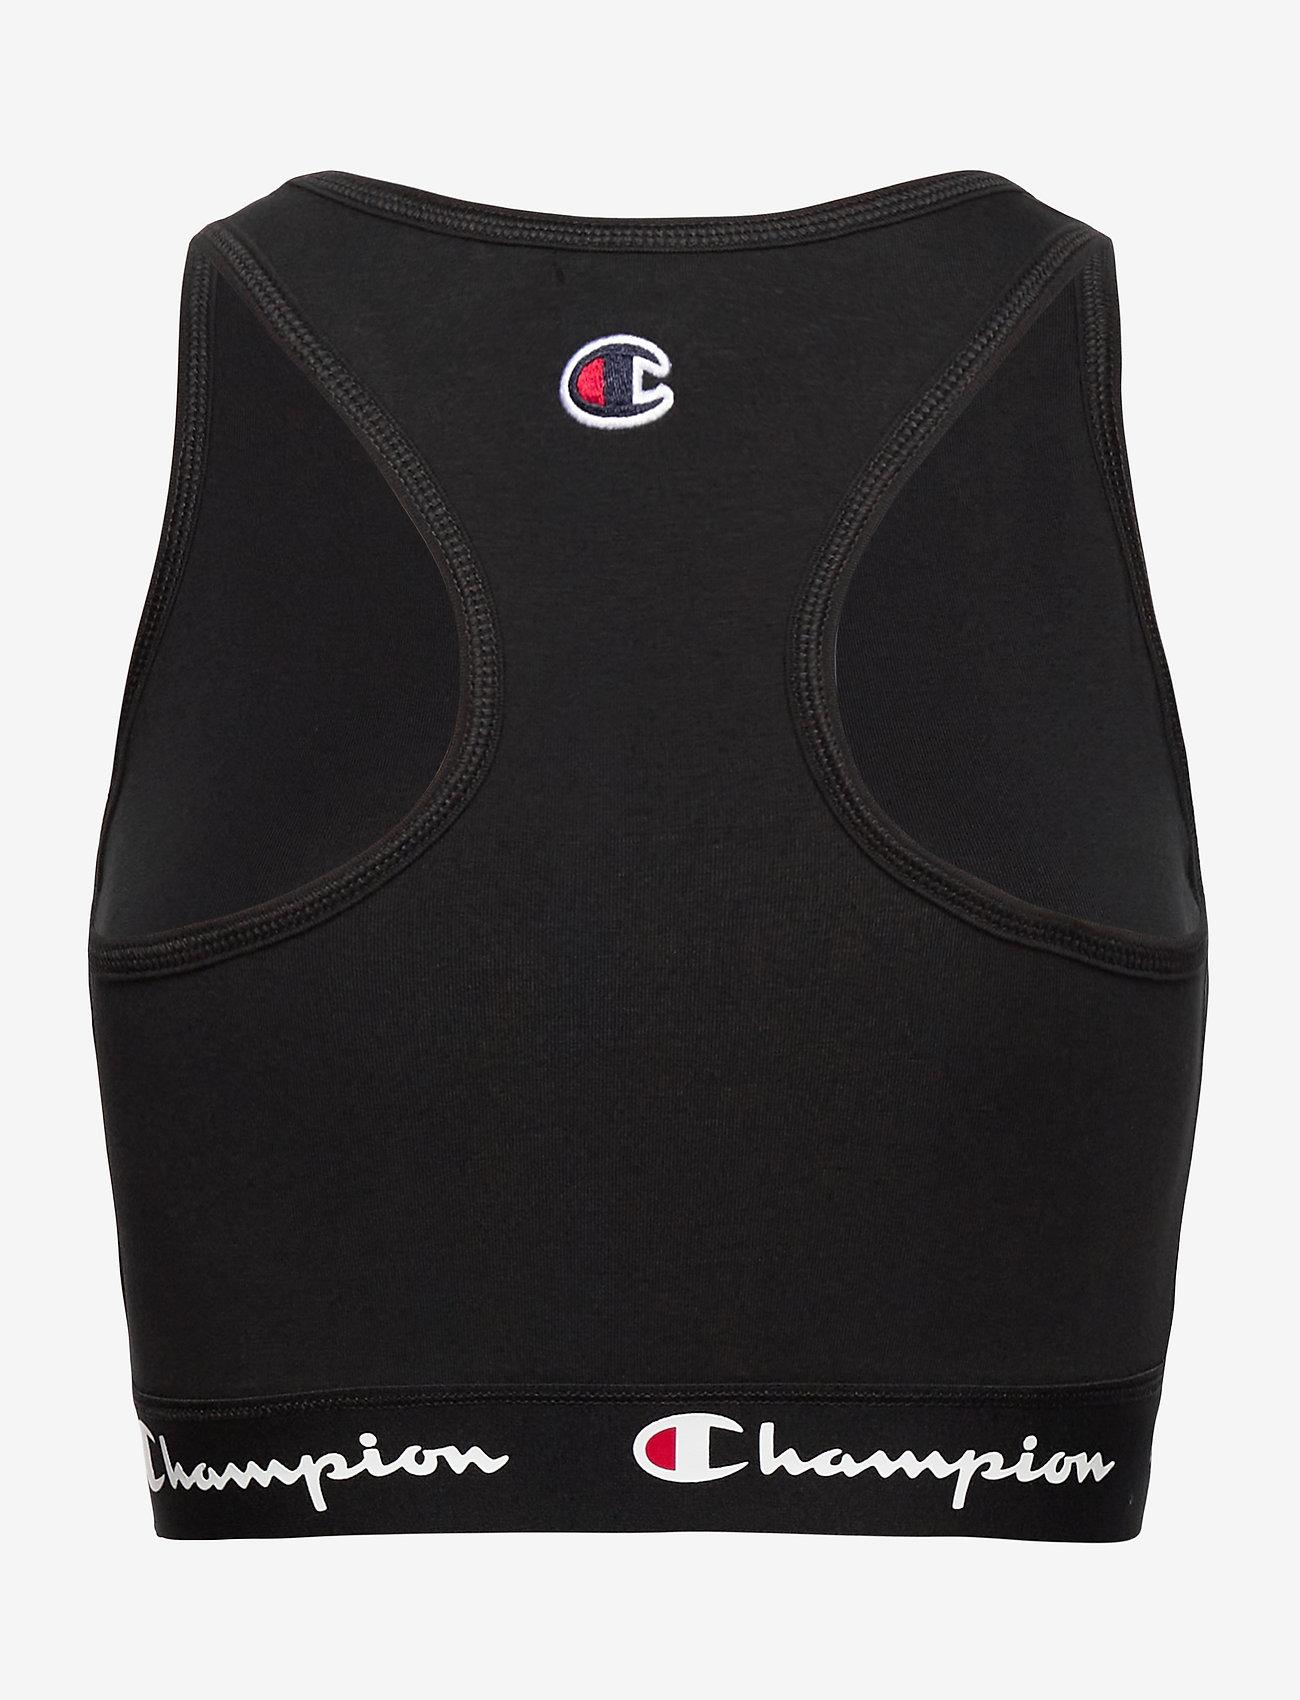 Champion - Bra - urheiluliivit - black beauty - 1